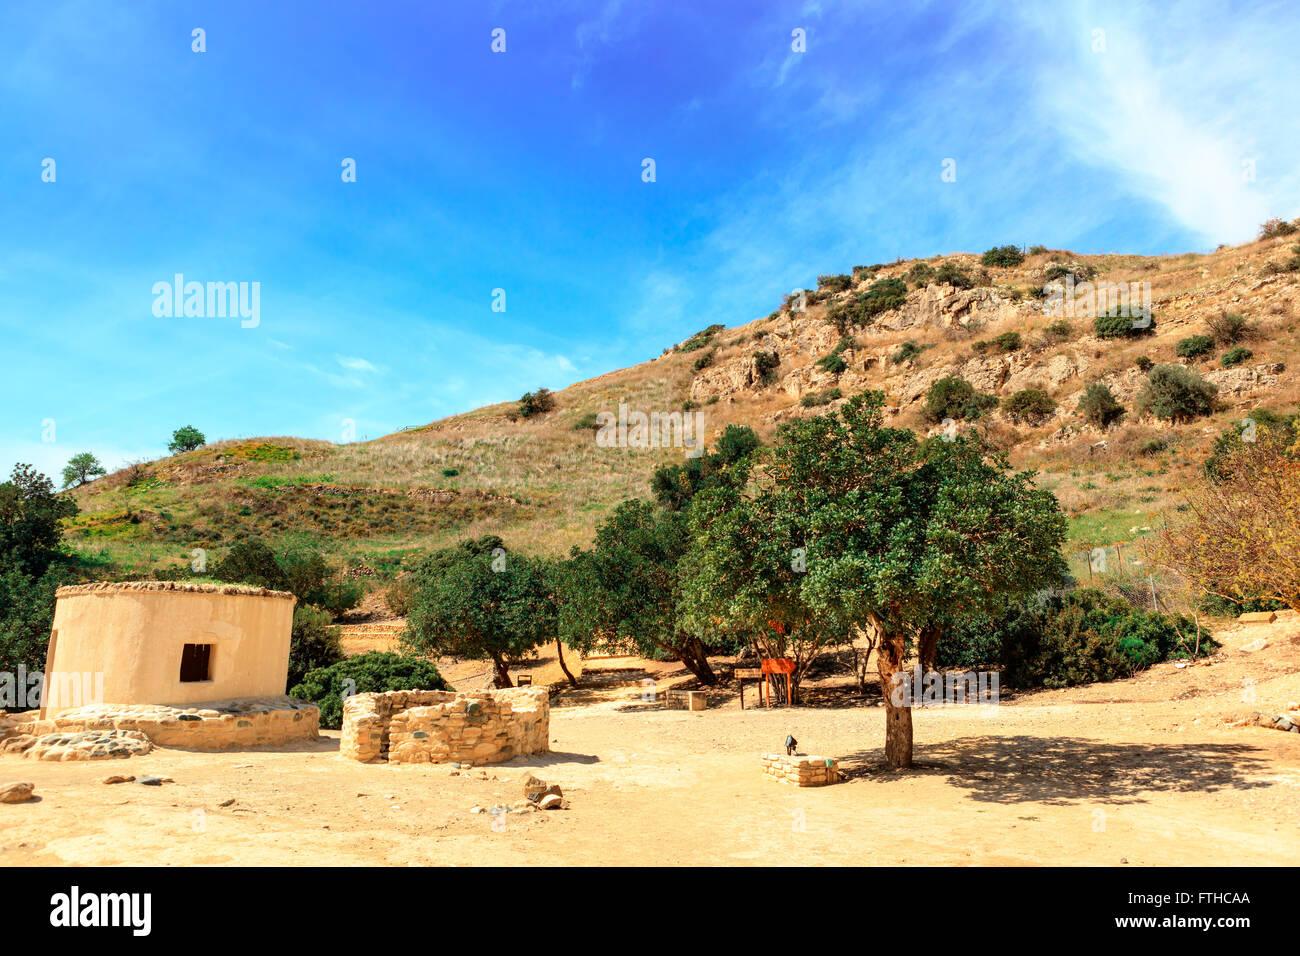 The Neolithic settlement of Choirokoitia, Cyprus. Stock Photo